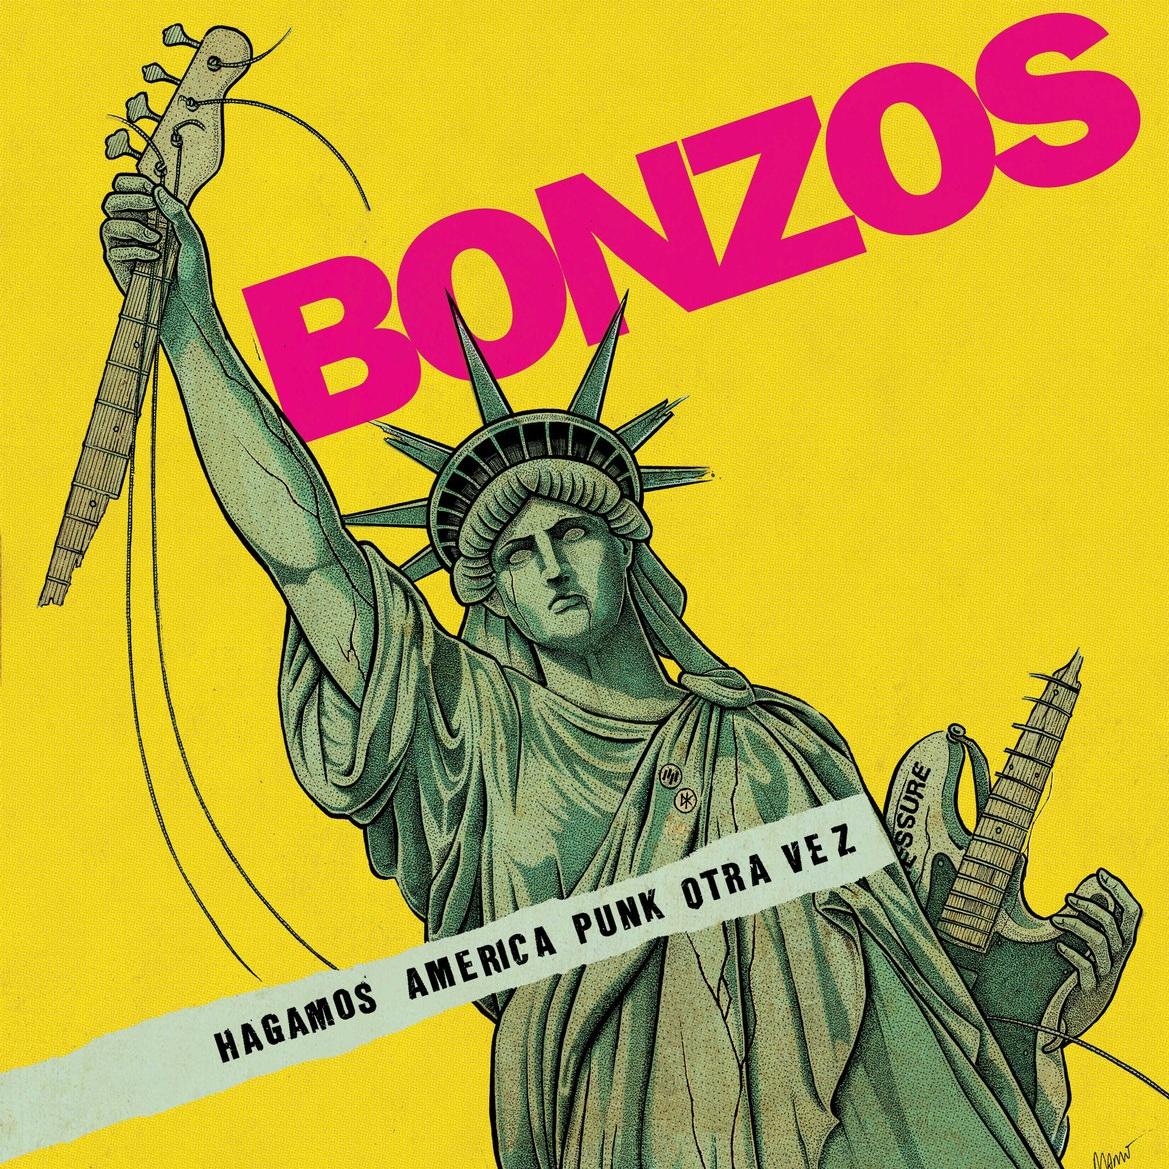 Bonzos - Hagamos Améerica Punk Otra Vez - 2017